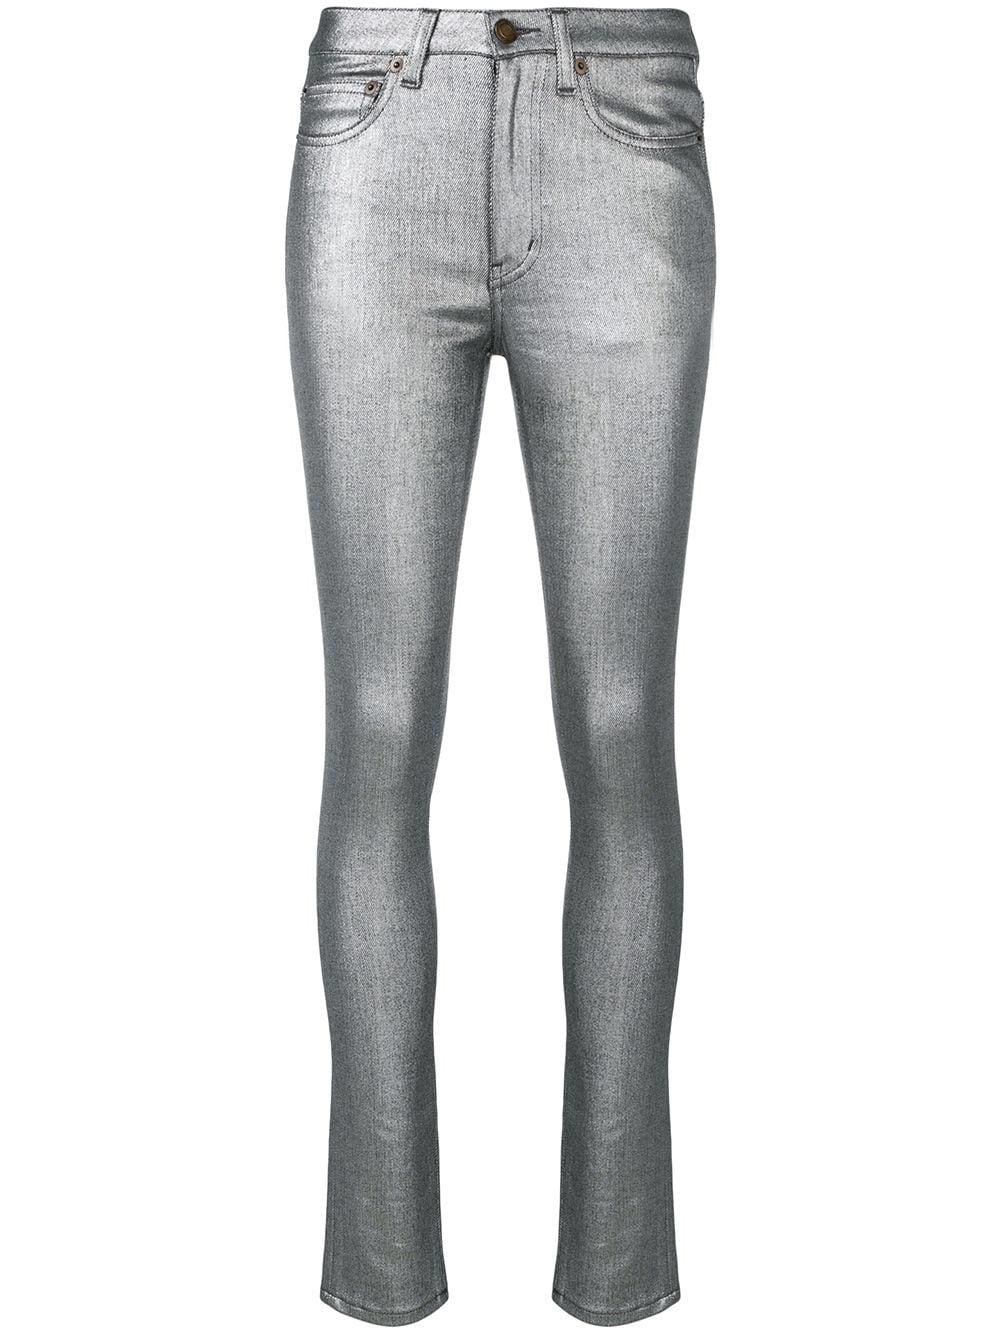 7f2edb8ed1 High-Rise Metallic Skinny Jeans in Silver